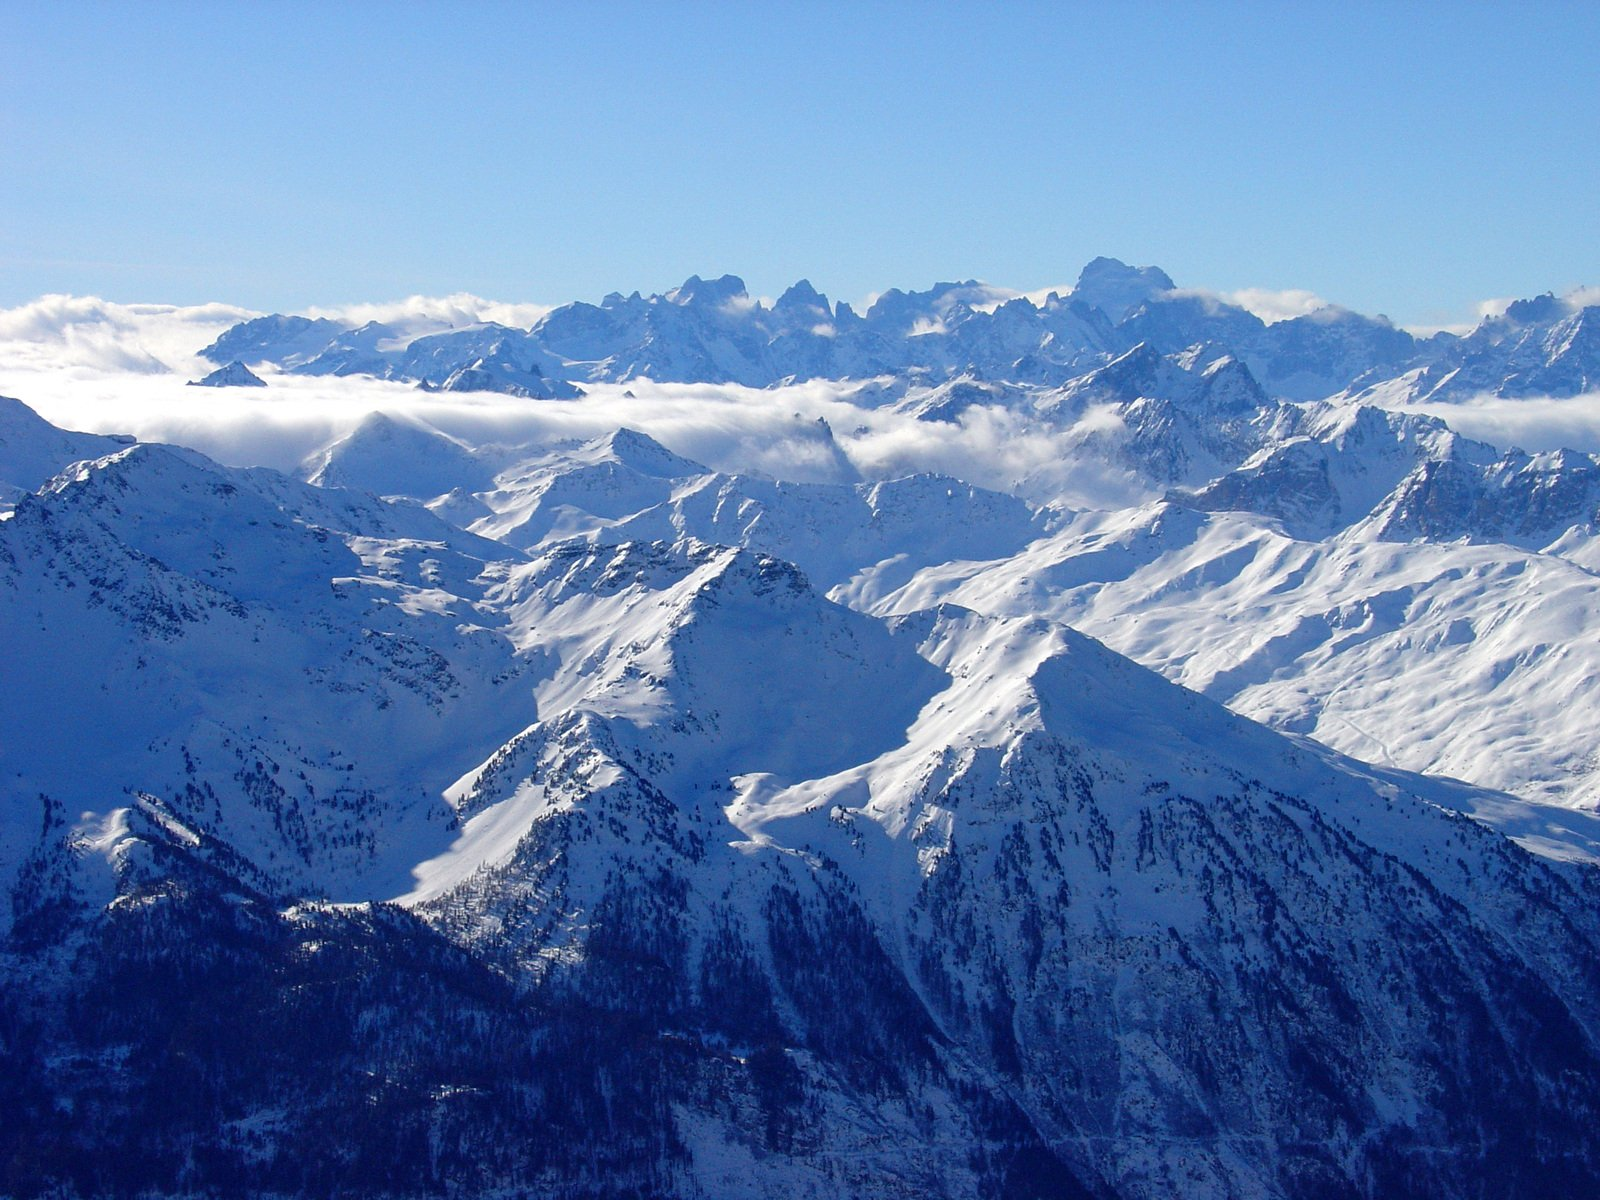 snowy-mountains-1519867.jpg